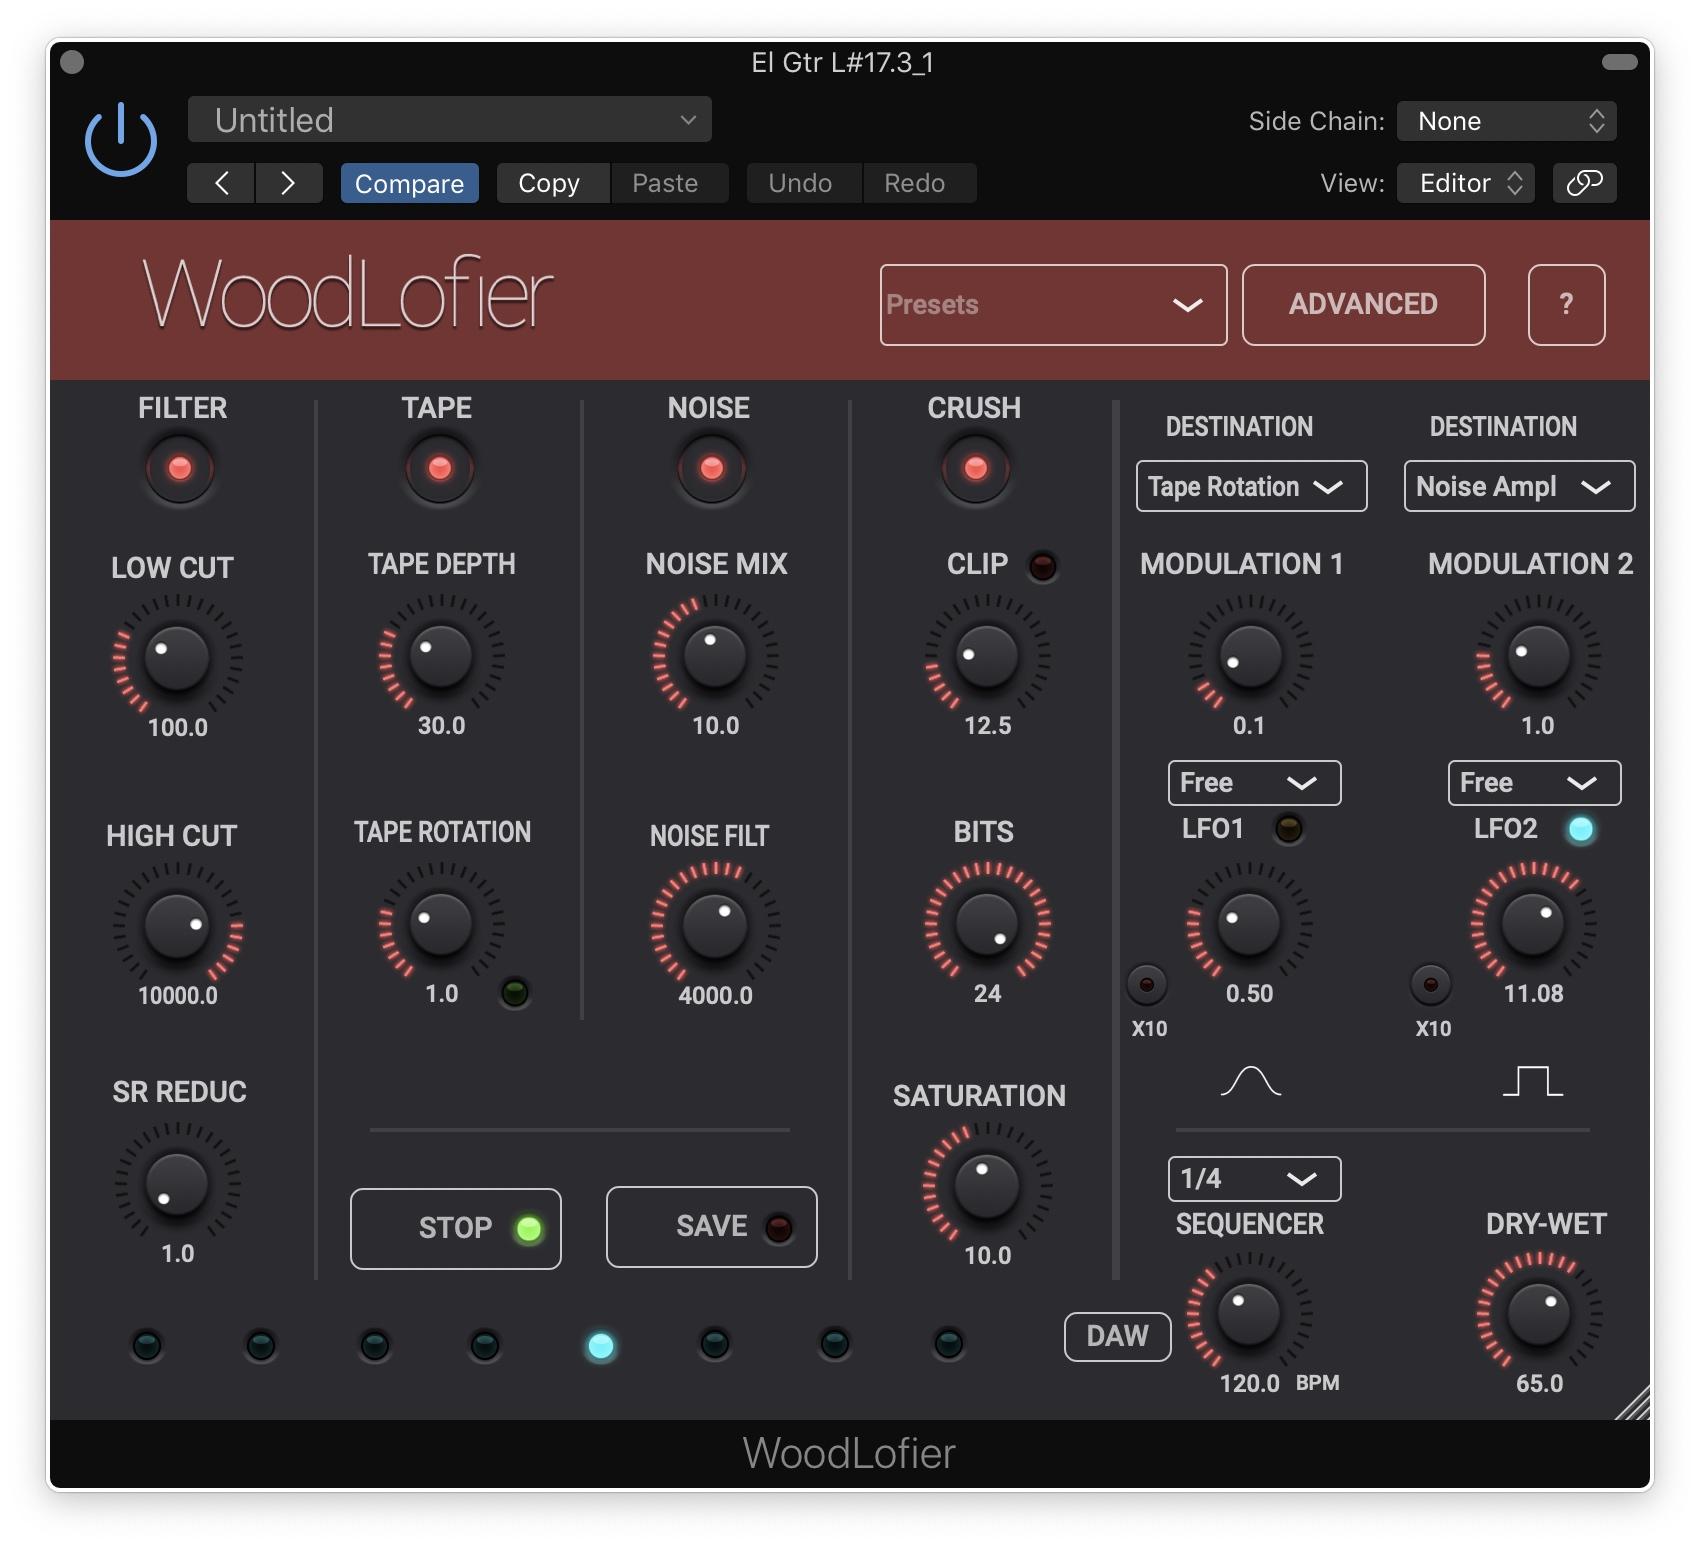 KVR: WoodLofier by Woodman's Immaculate Maple Syrup Studio - Lo-Fi